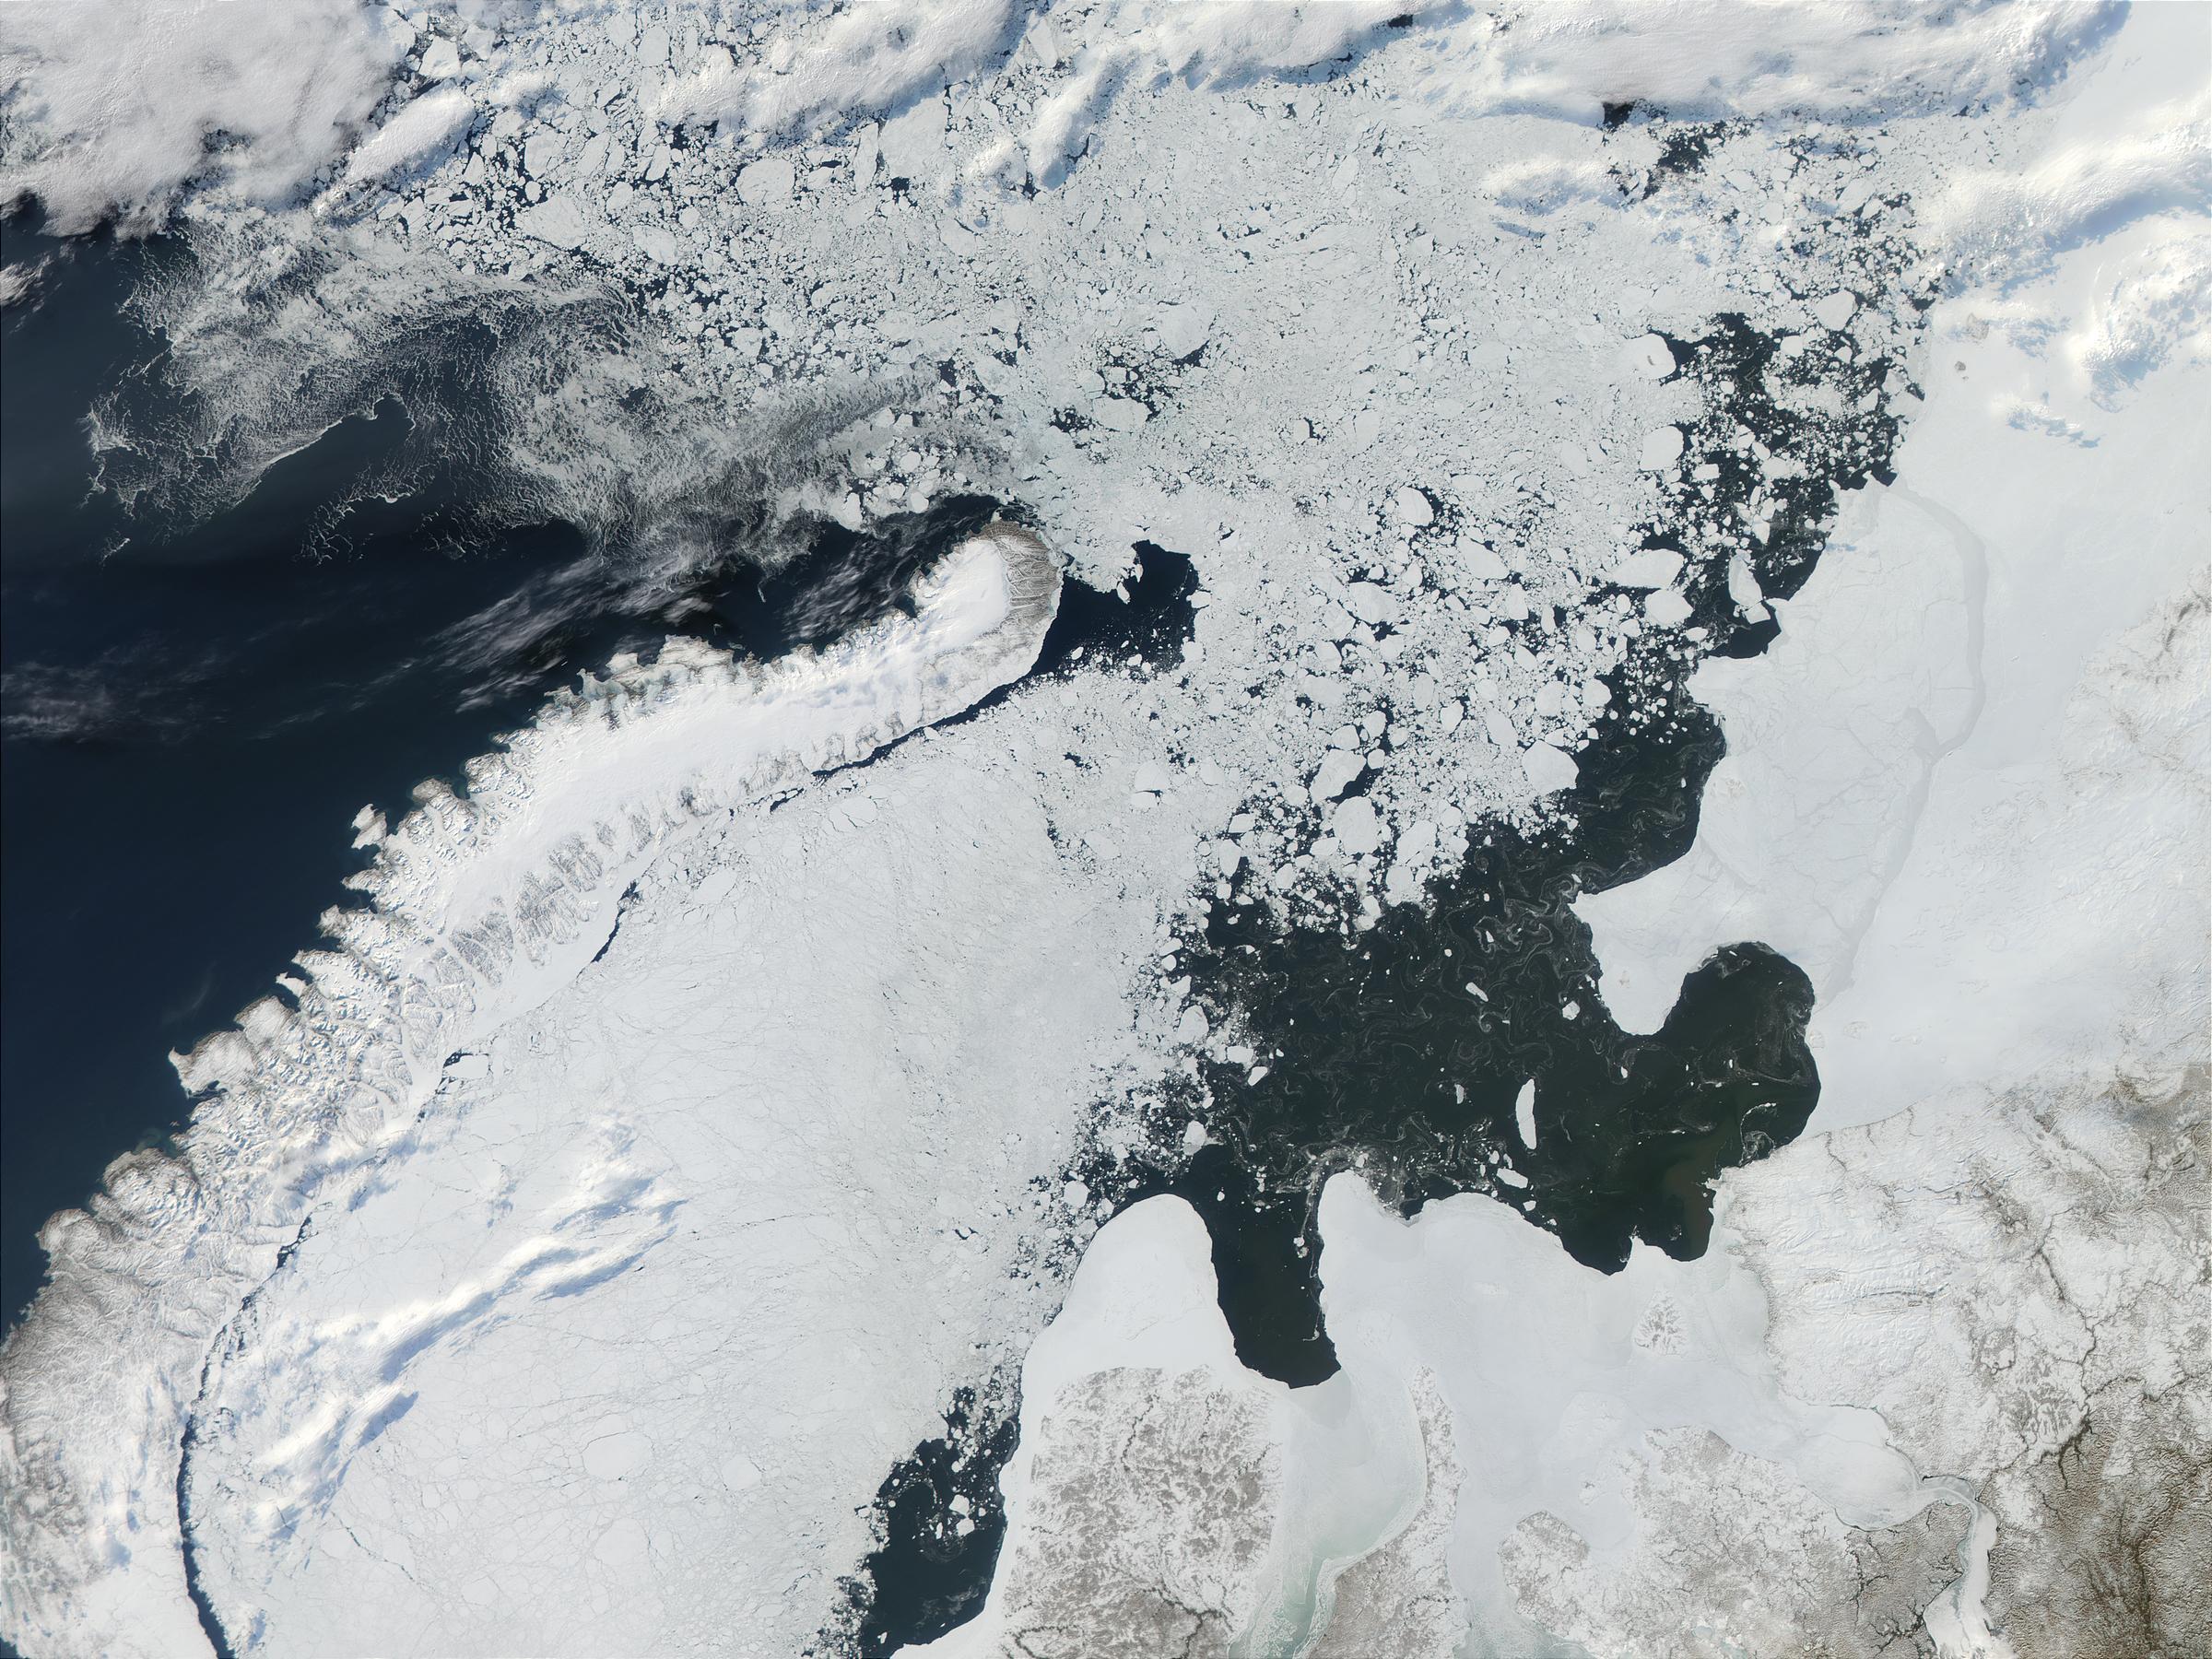 Novaya Zemlya and Kara Sea, Russia - related image preview